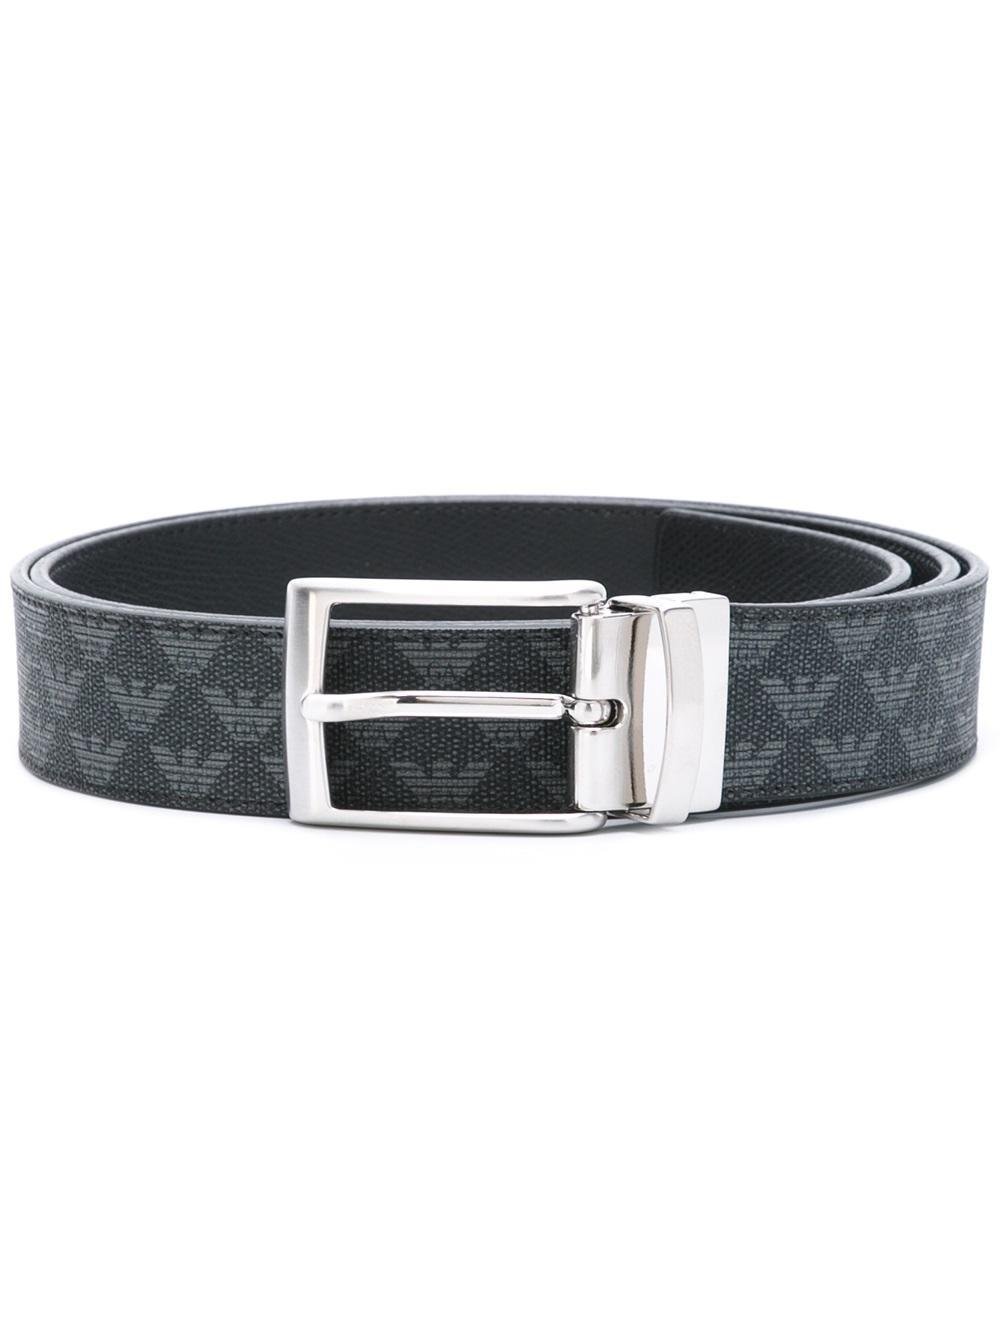 Emporio armani Logo Belt in Black for Men   Lyst